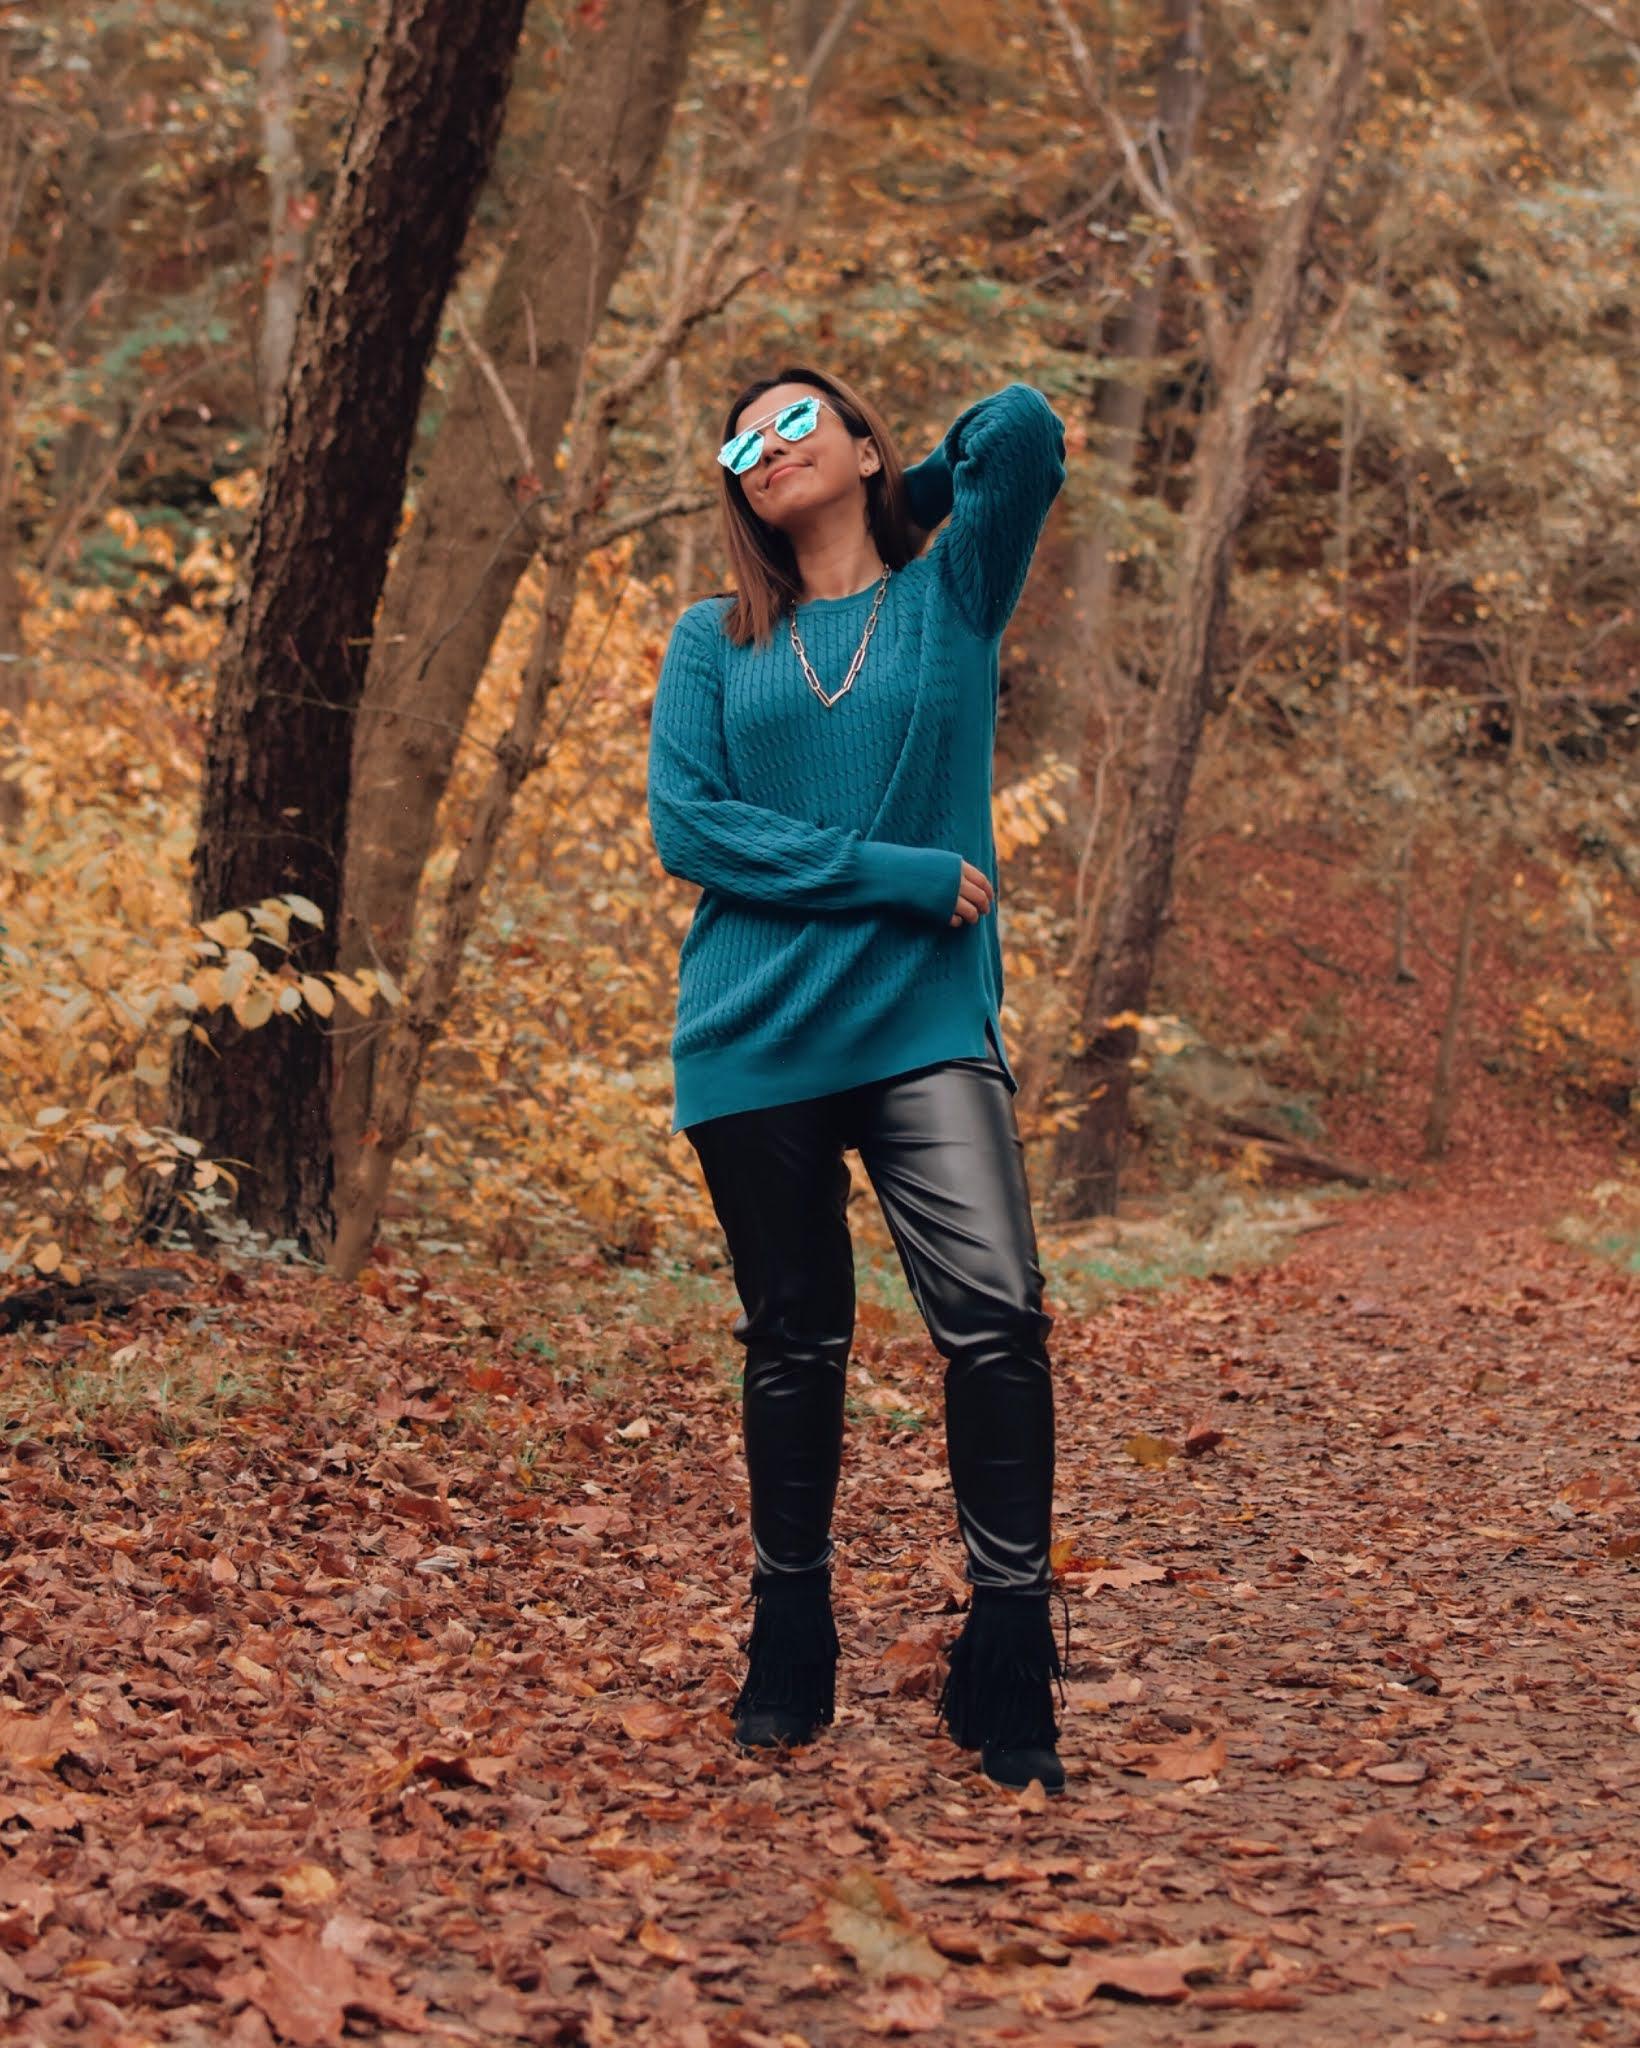 Ocomo crear outfits desde cero-faux leather pants-otoño 2020-mariestilo